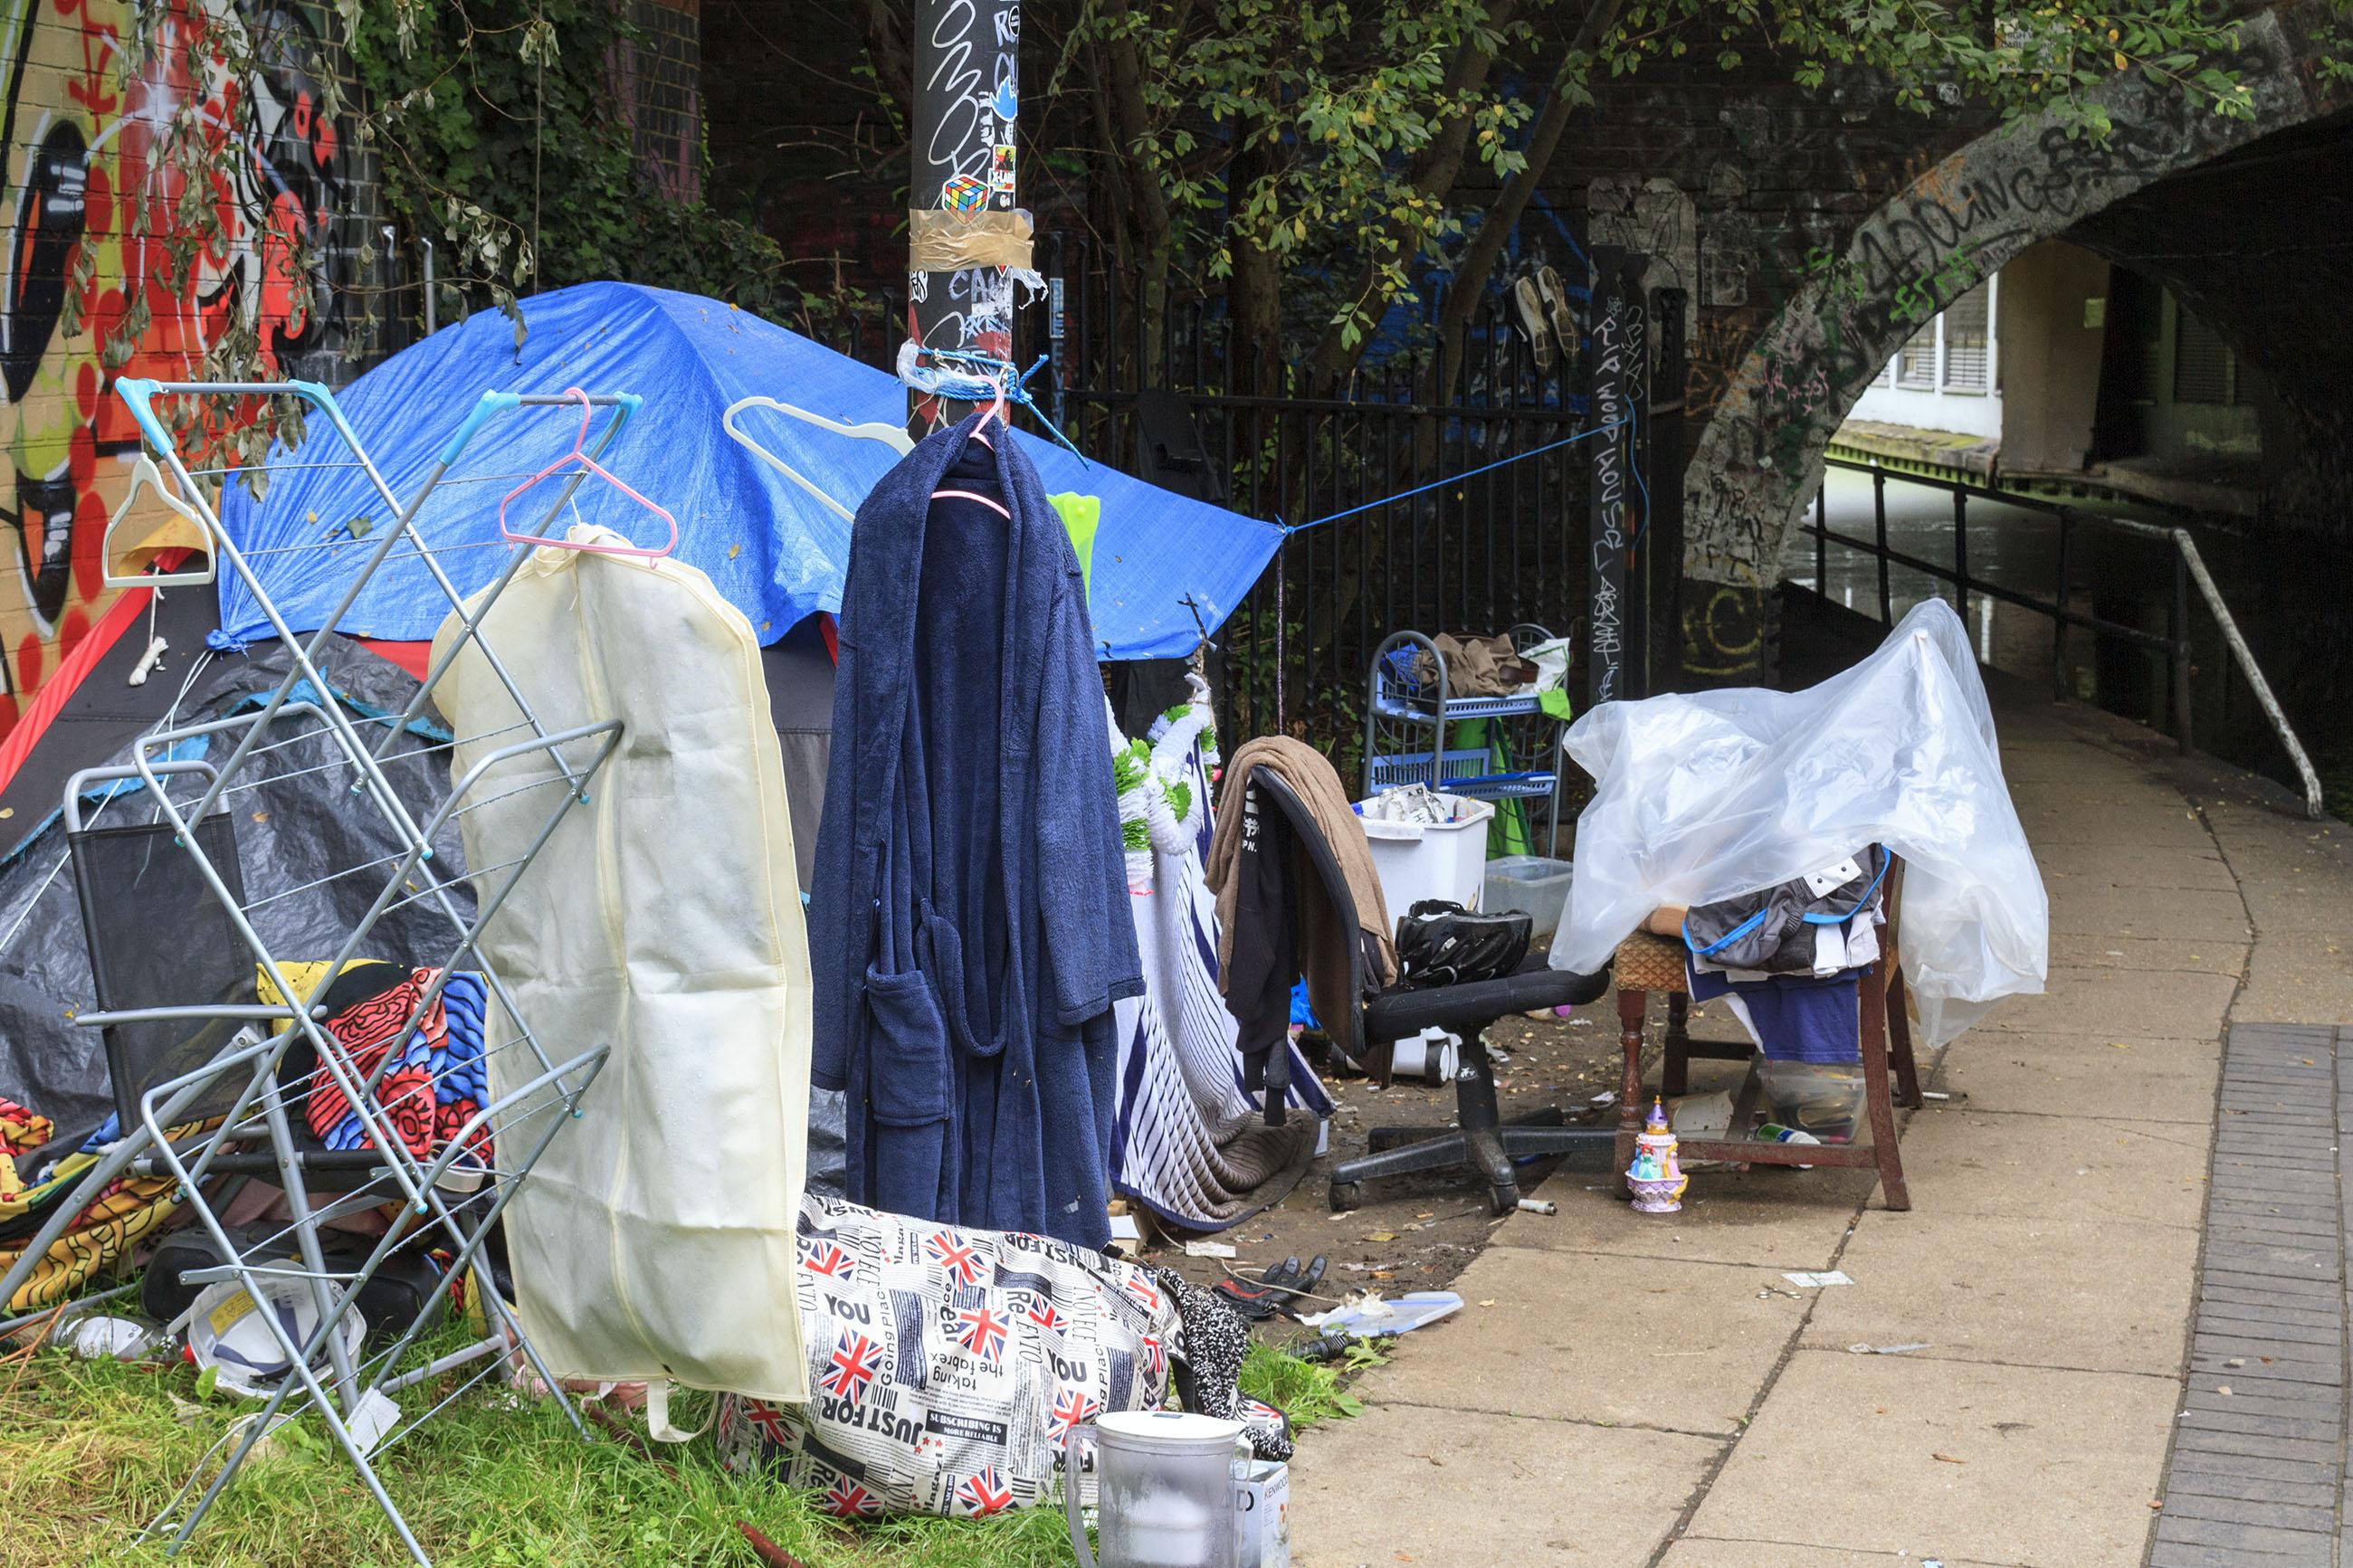 Trent suggesting homelessness, Alternative, Living, Urban, Uk, HQ Photo